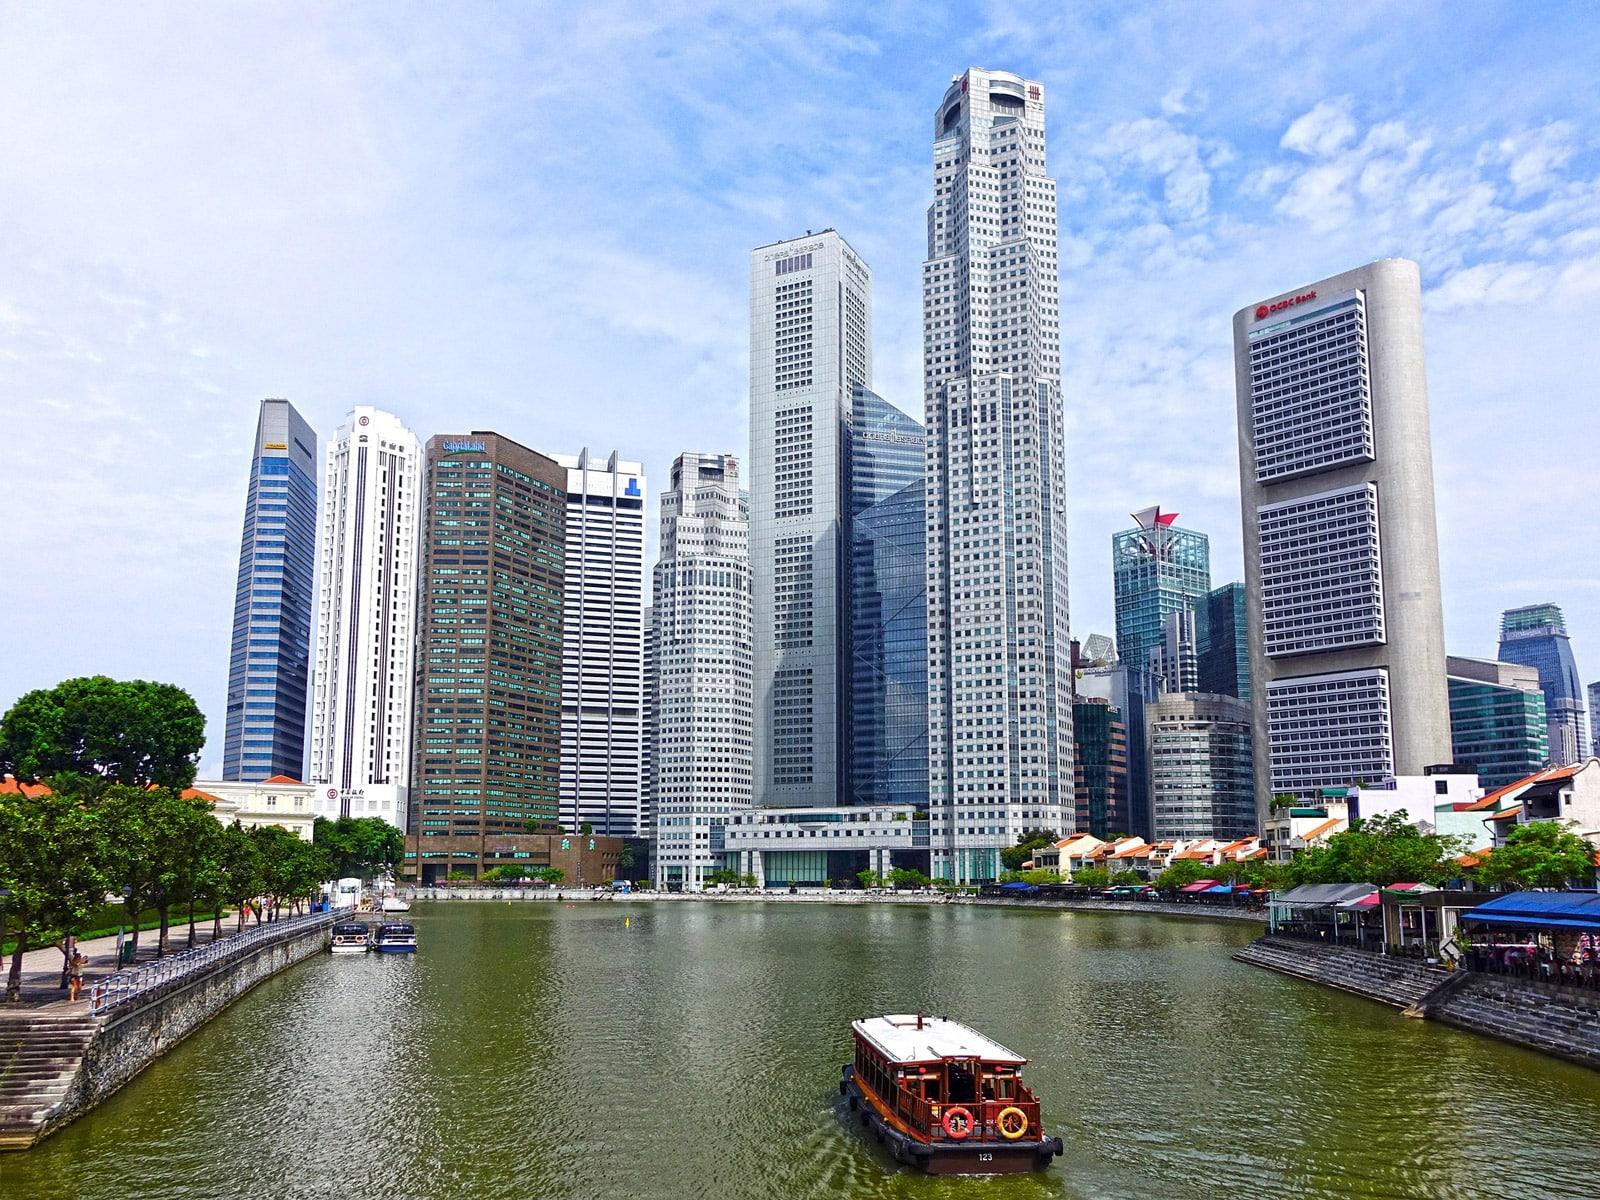 rondreis singapore blog stop over